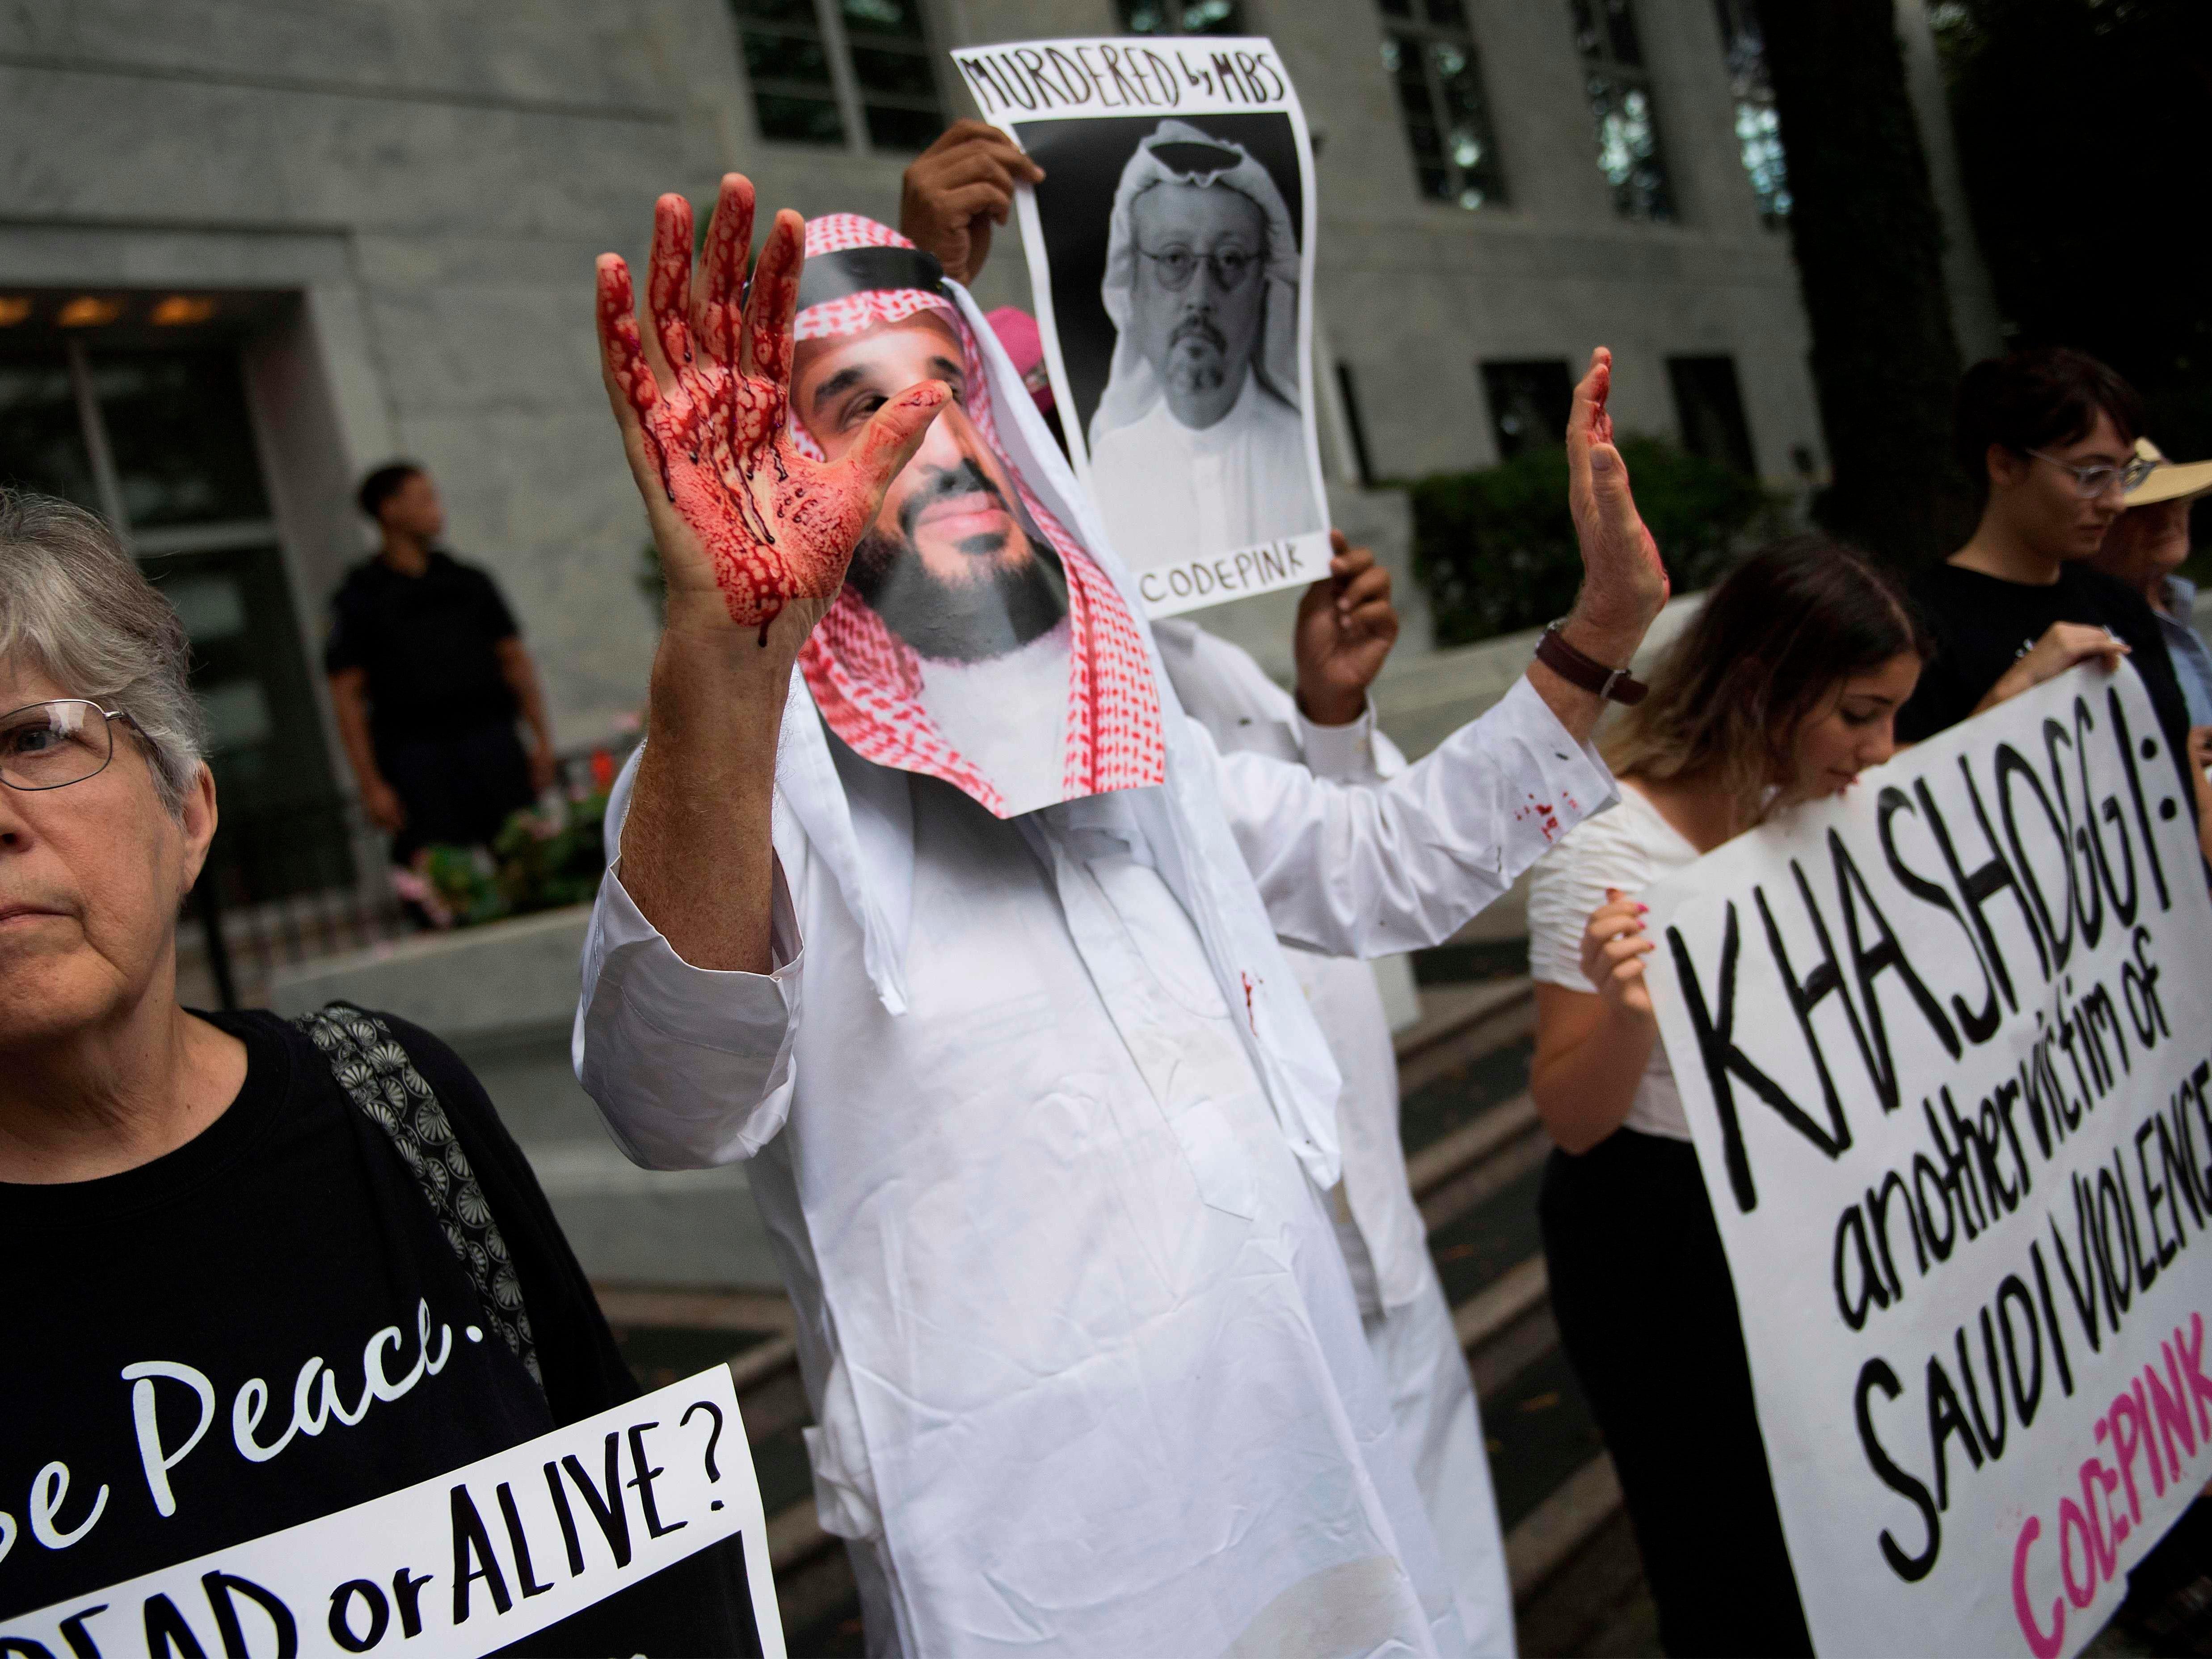 A demonstrator dressed as Saudi Arabian Crown Prince Mohammed bin Salman protests outside the Saudi Embassy in Washington, Oct. 8, 2018.